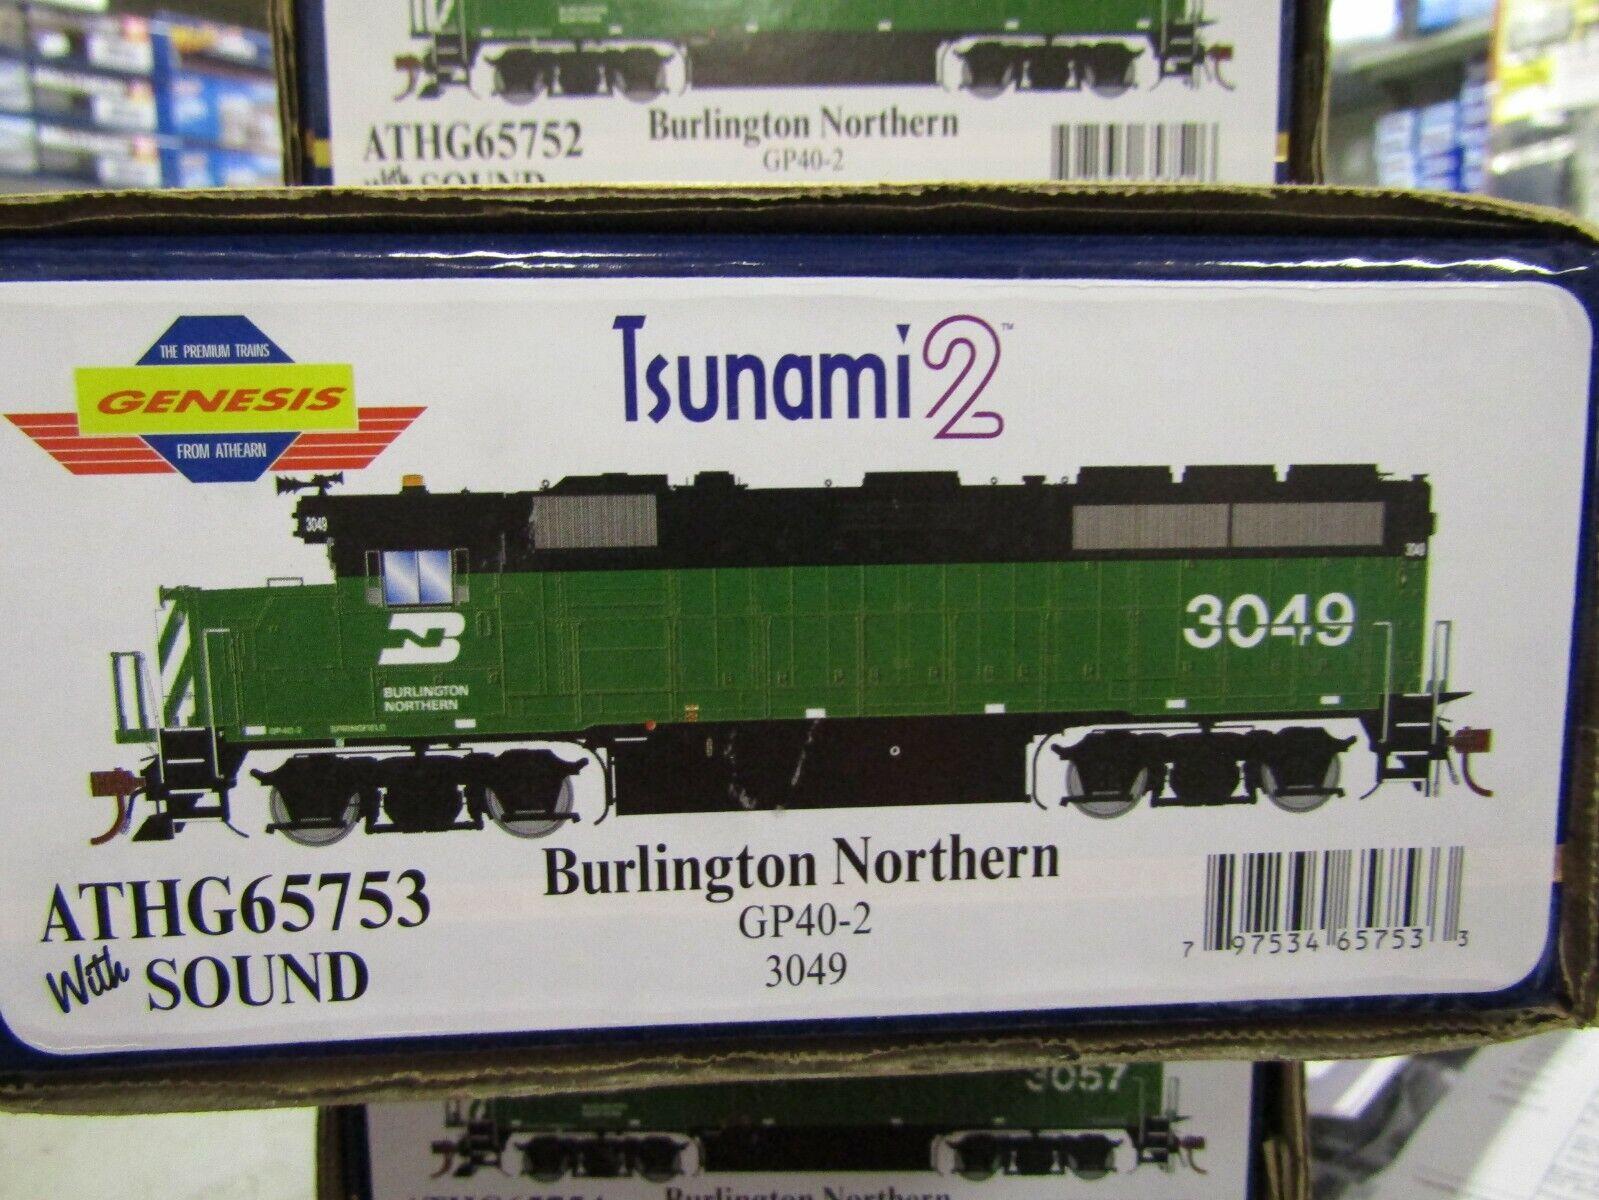 ATHEARN G65753 BURLINGTON NORTHERN GP40-2 HO TSUNAMI 2 2 2 DCC & SND ,DC  RD  3049 a4c756